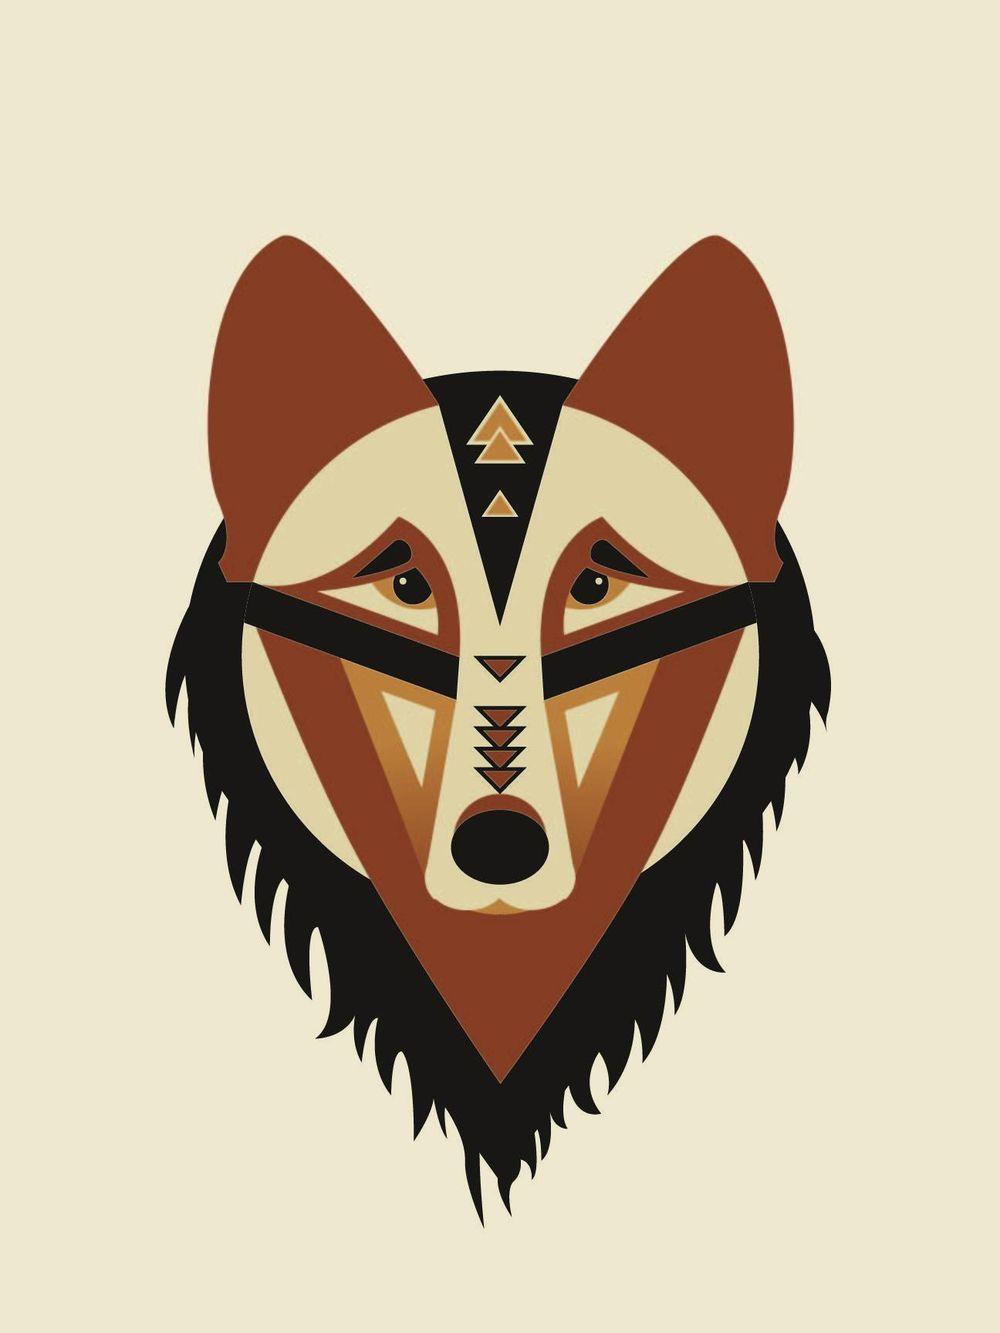 Geometric Wolf - image 4 - student project